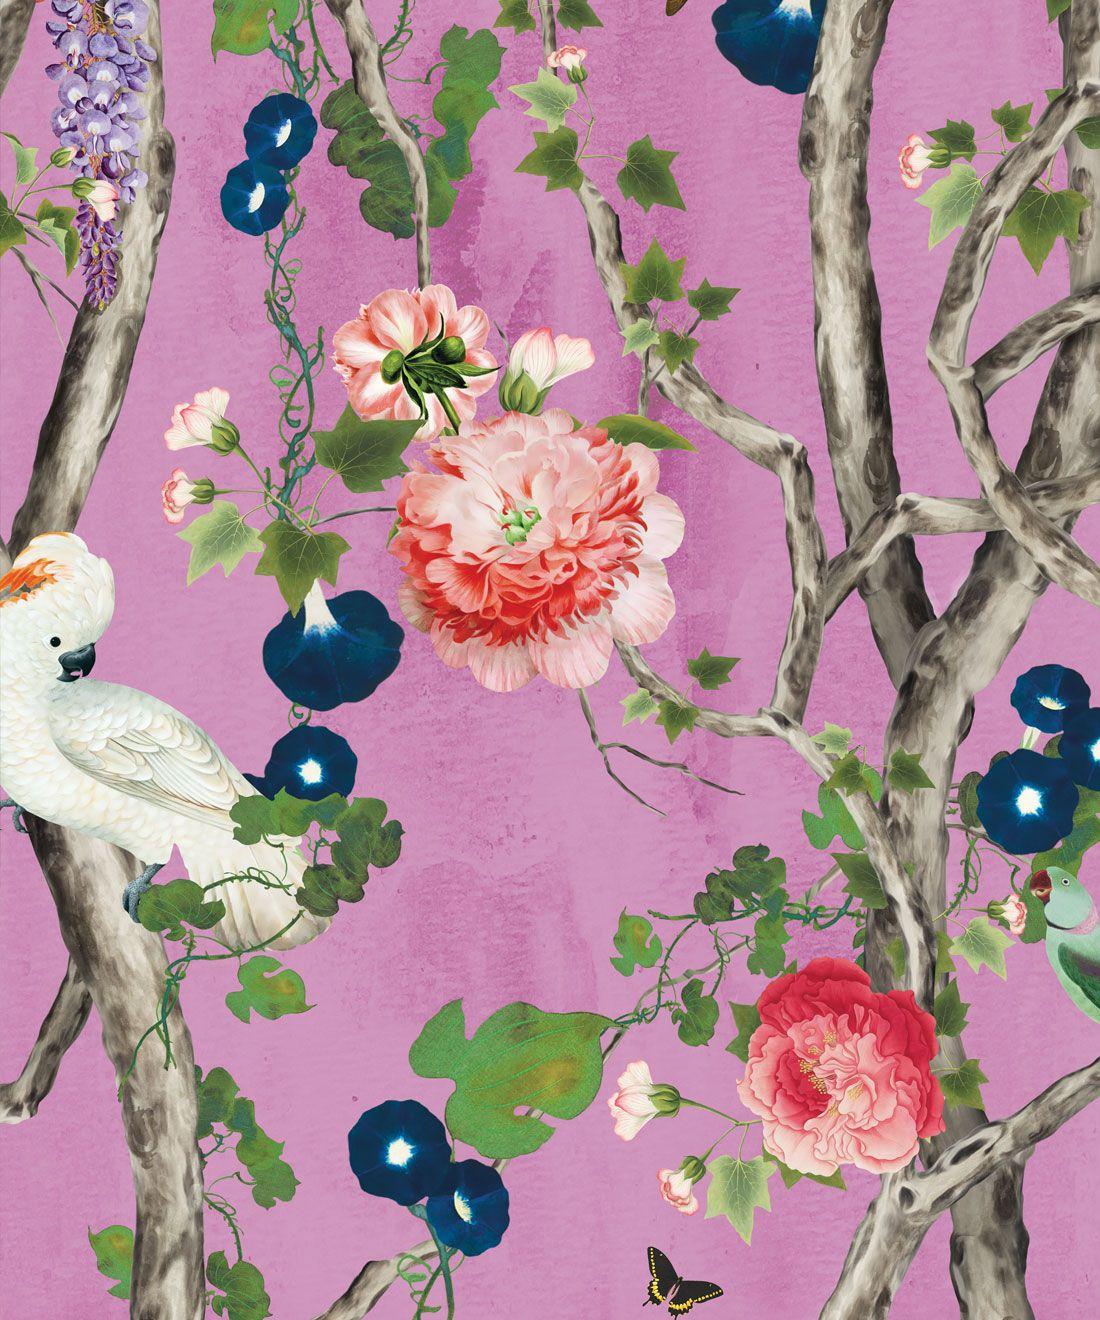 Empress Wallpaper • Romantic Wallpaper • Floral Wallpaper • Chinoiserie Wallpaper • Plum Purple colour wallpaper swatch